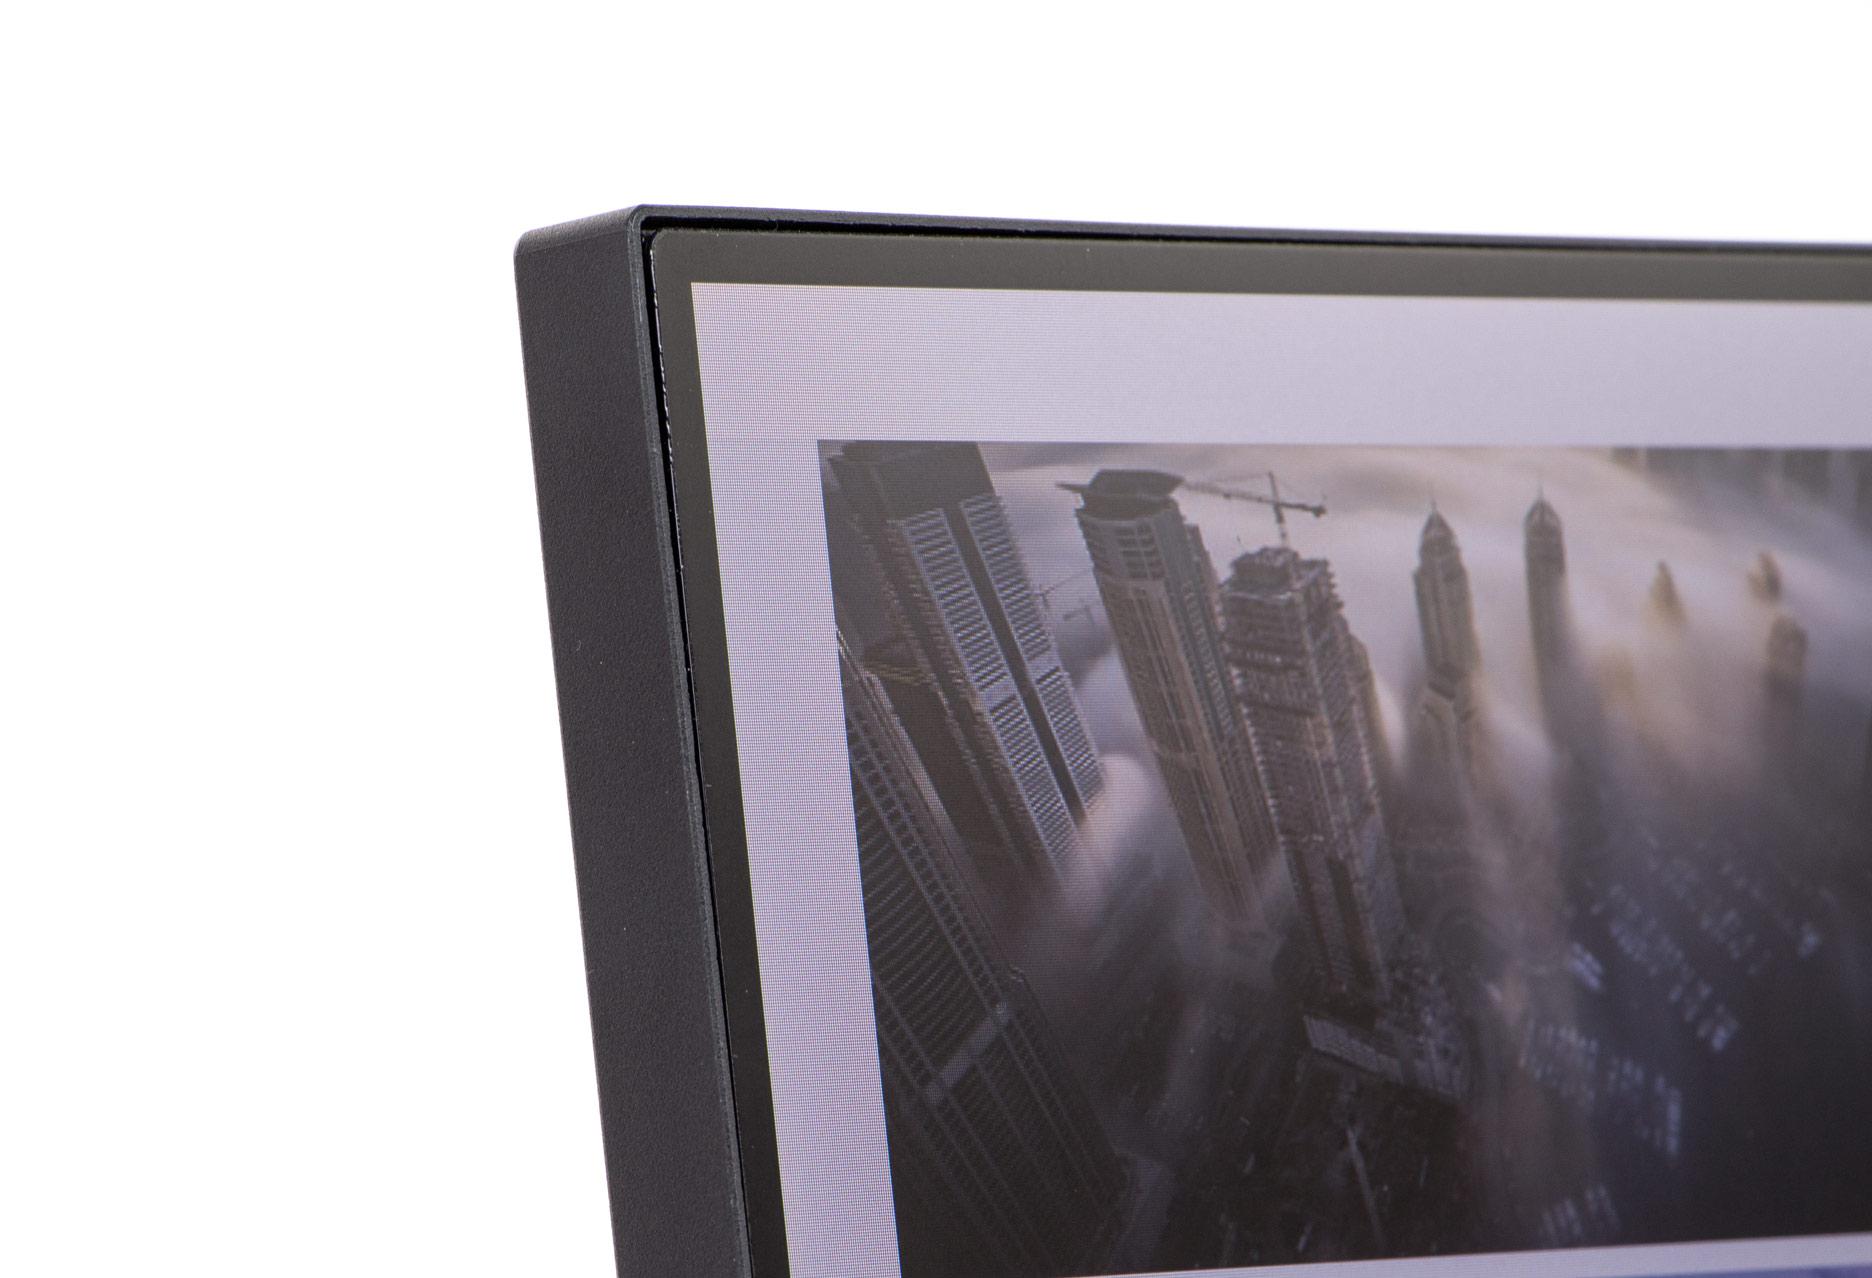 Eizo FlexScan EV2456 ramka wokół ekranu